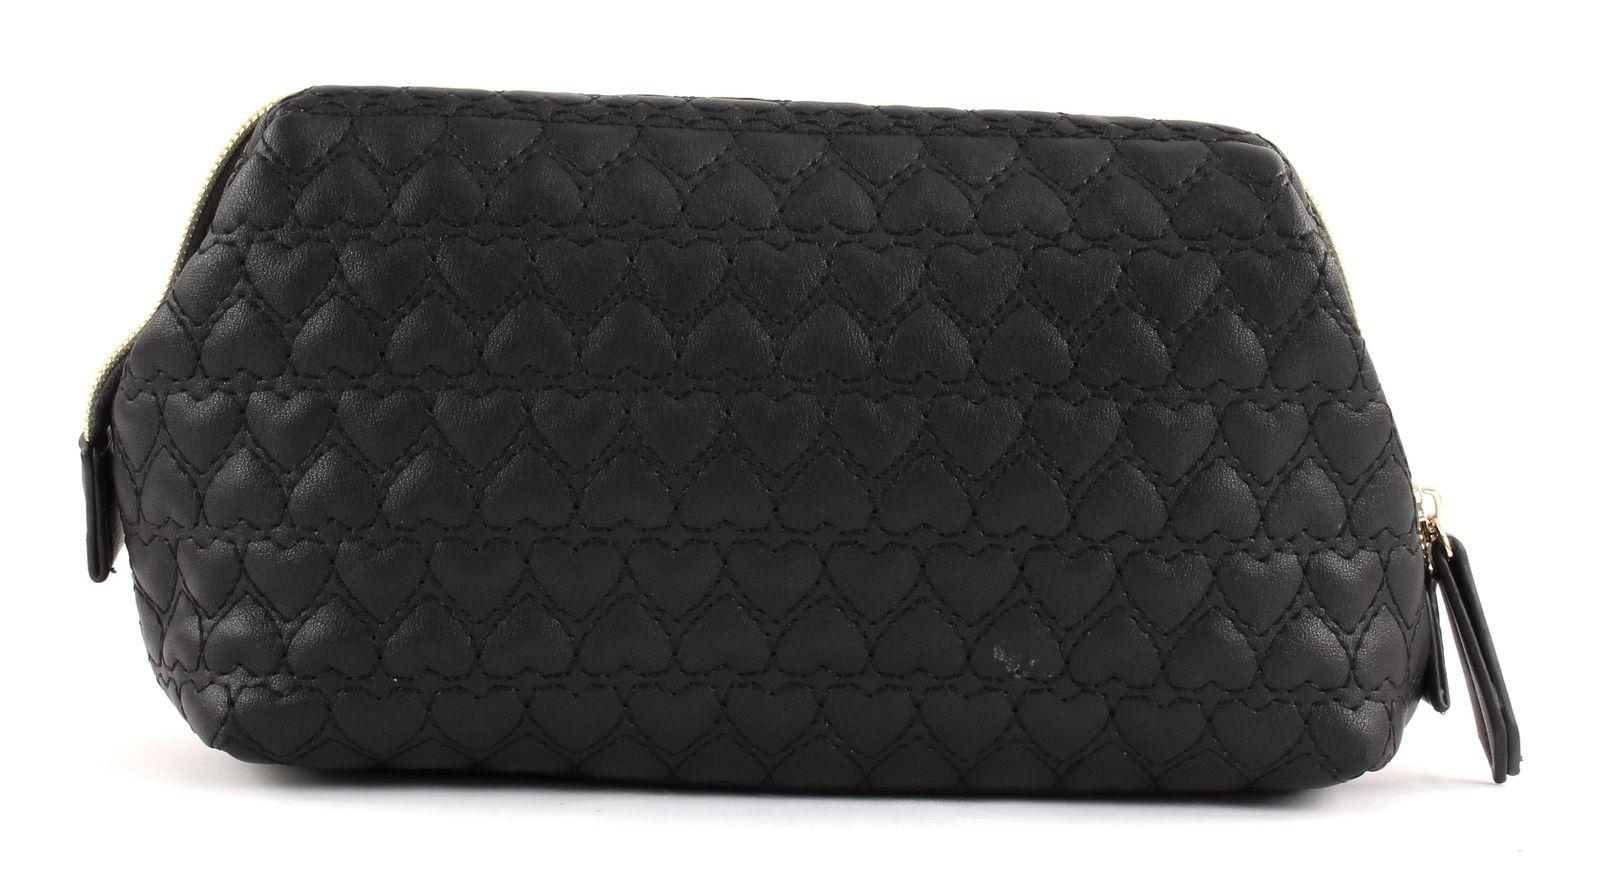 ae7434e086065 ... To CloseVALENTINO Golden Beauty Bag M NeroTap To CloseNur möglich bei  sofortigem Zahlungseingang mit Paypal